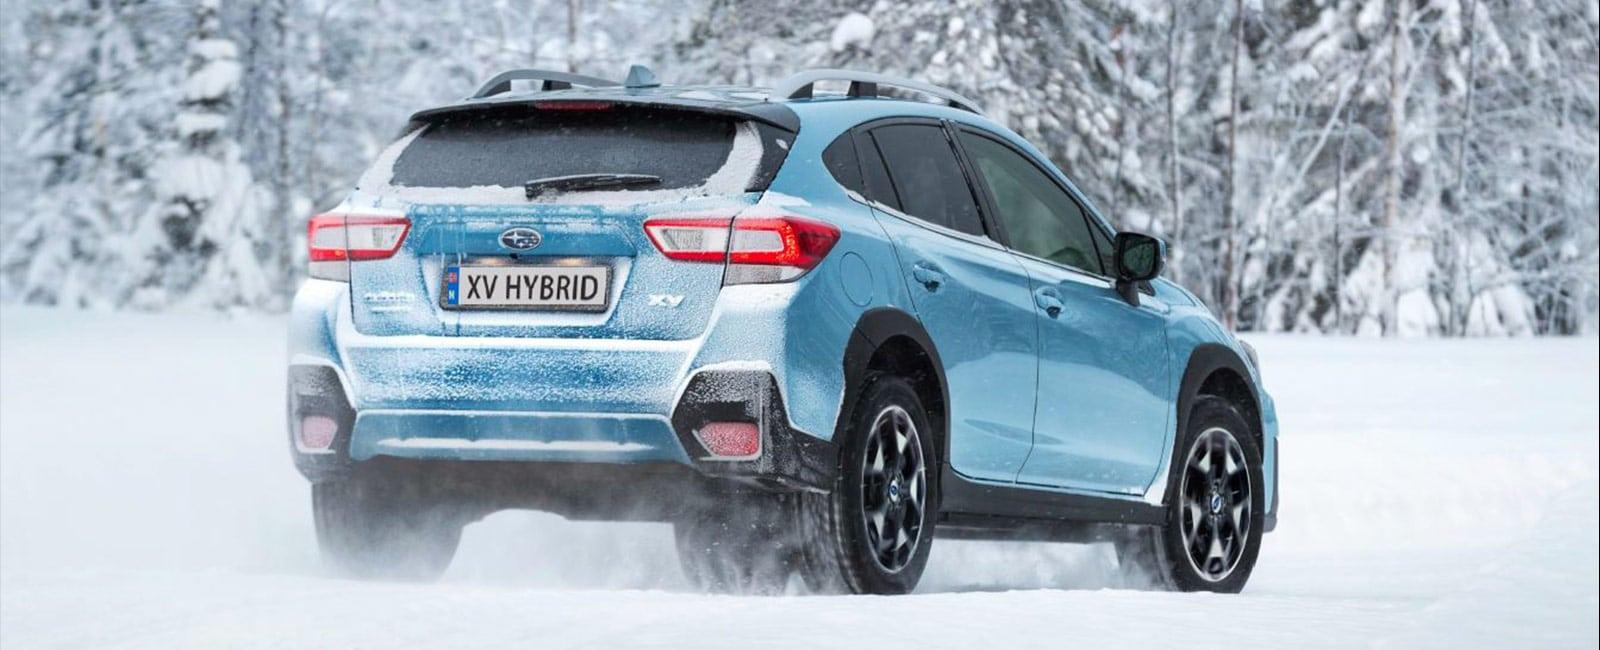 Subaru XV Hybrid på snøføre